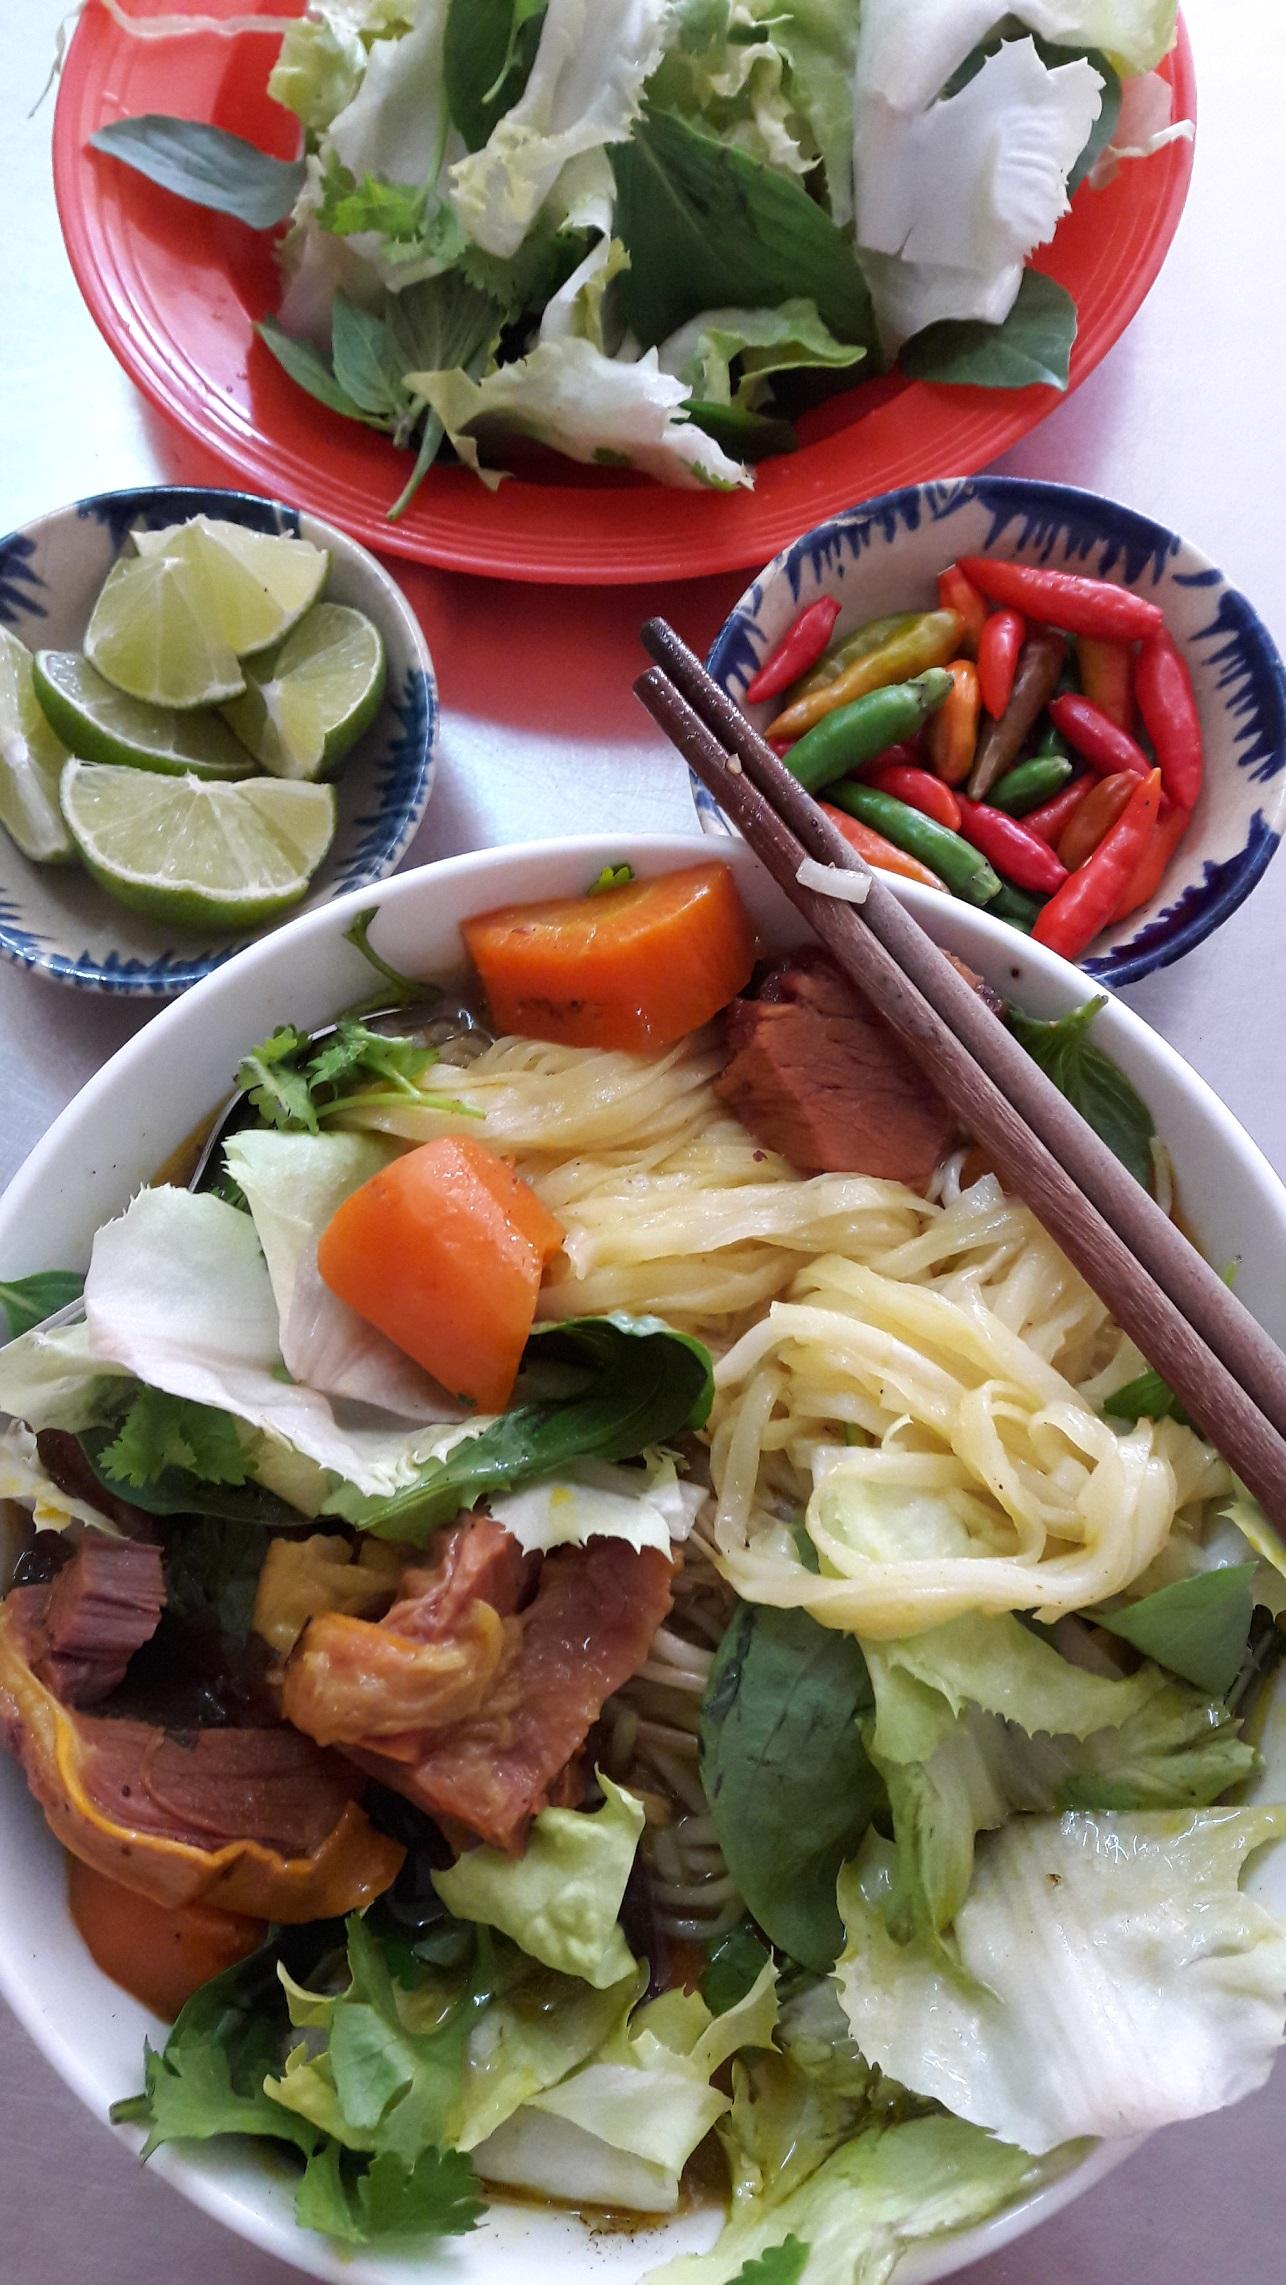 Bo kho, Vietnamese beef stew